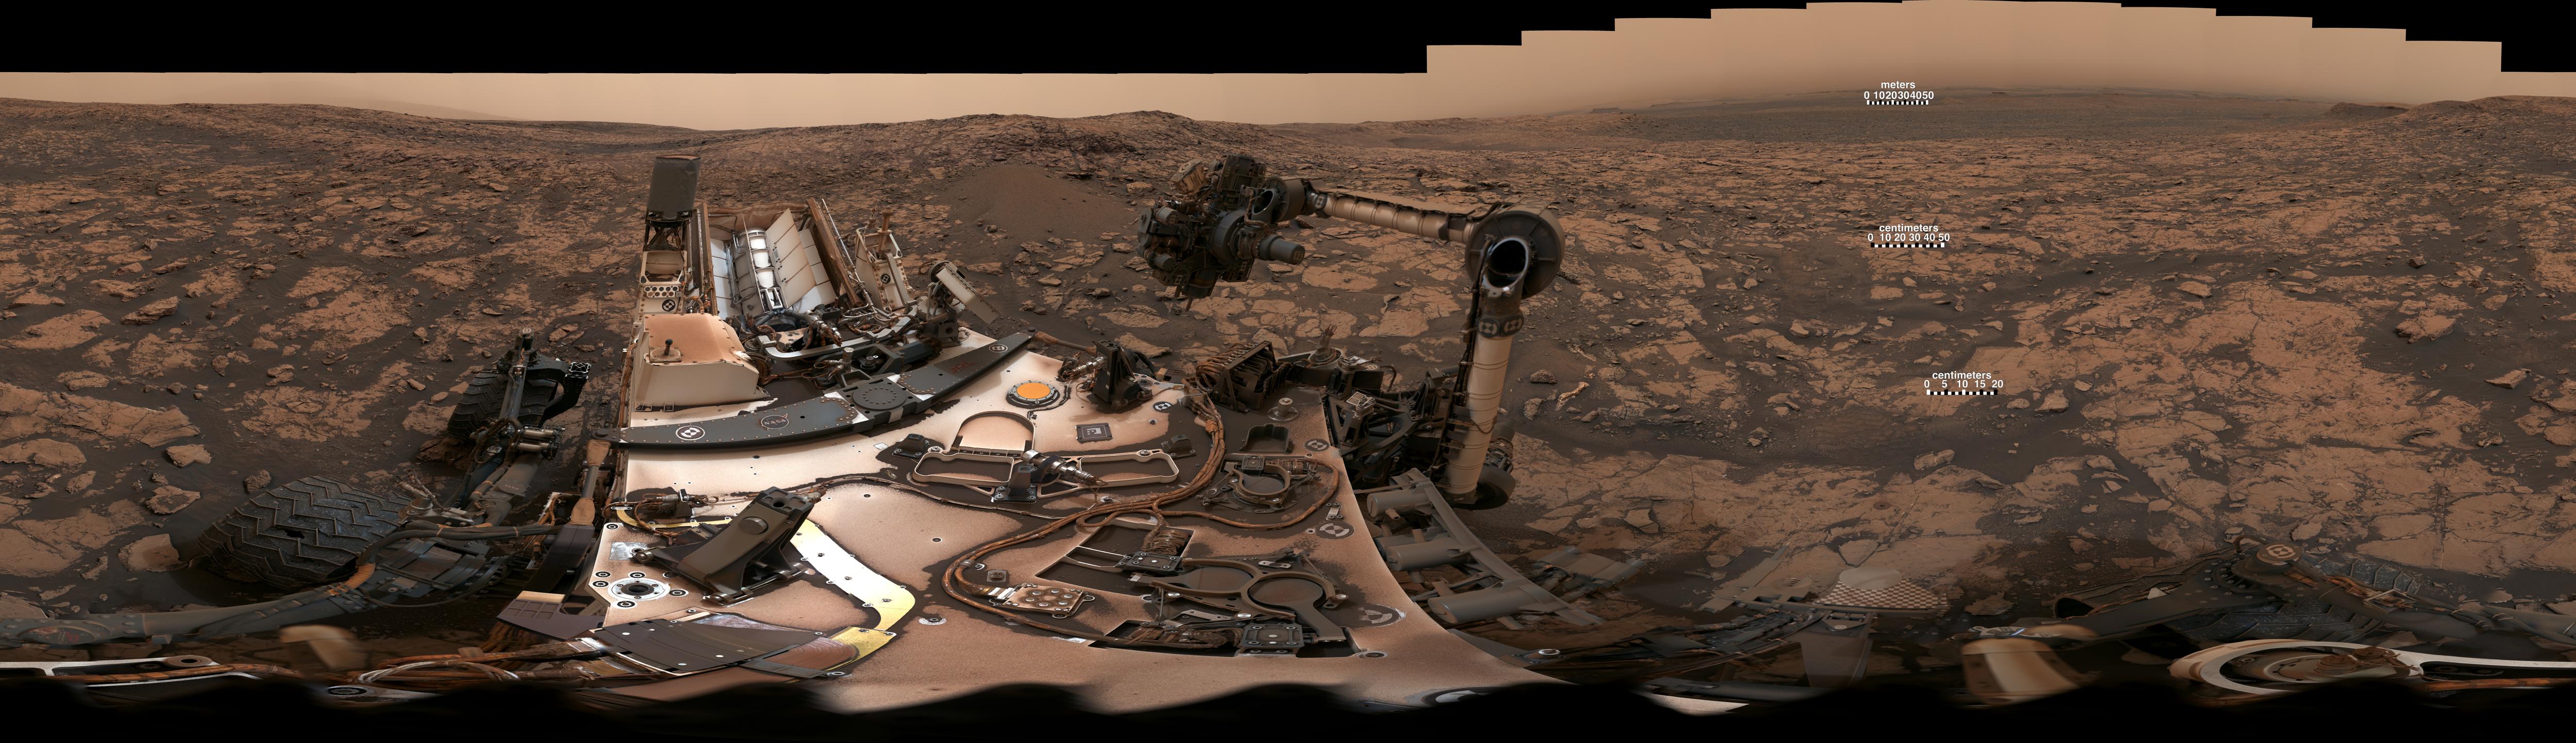 Curiosity panorama shows still-dusty Mars from Vera Rubin Ridge